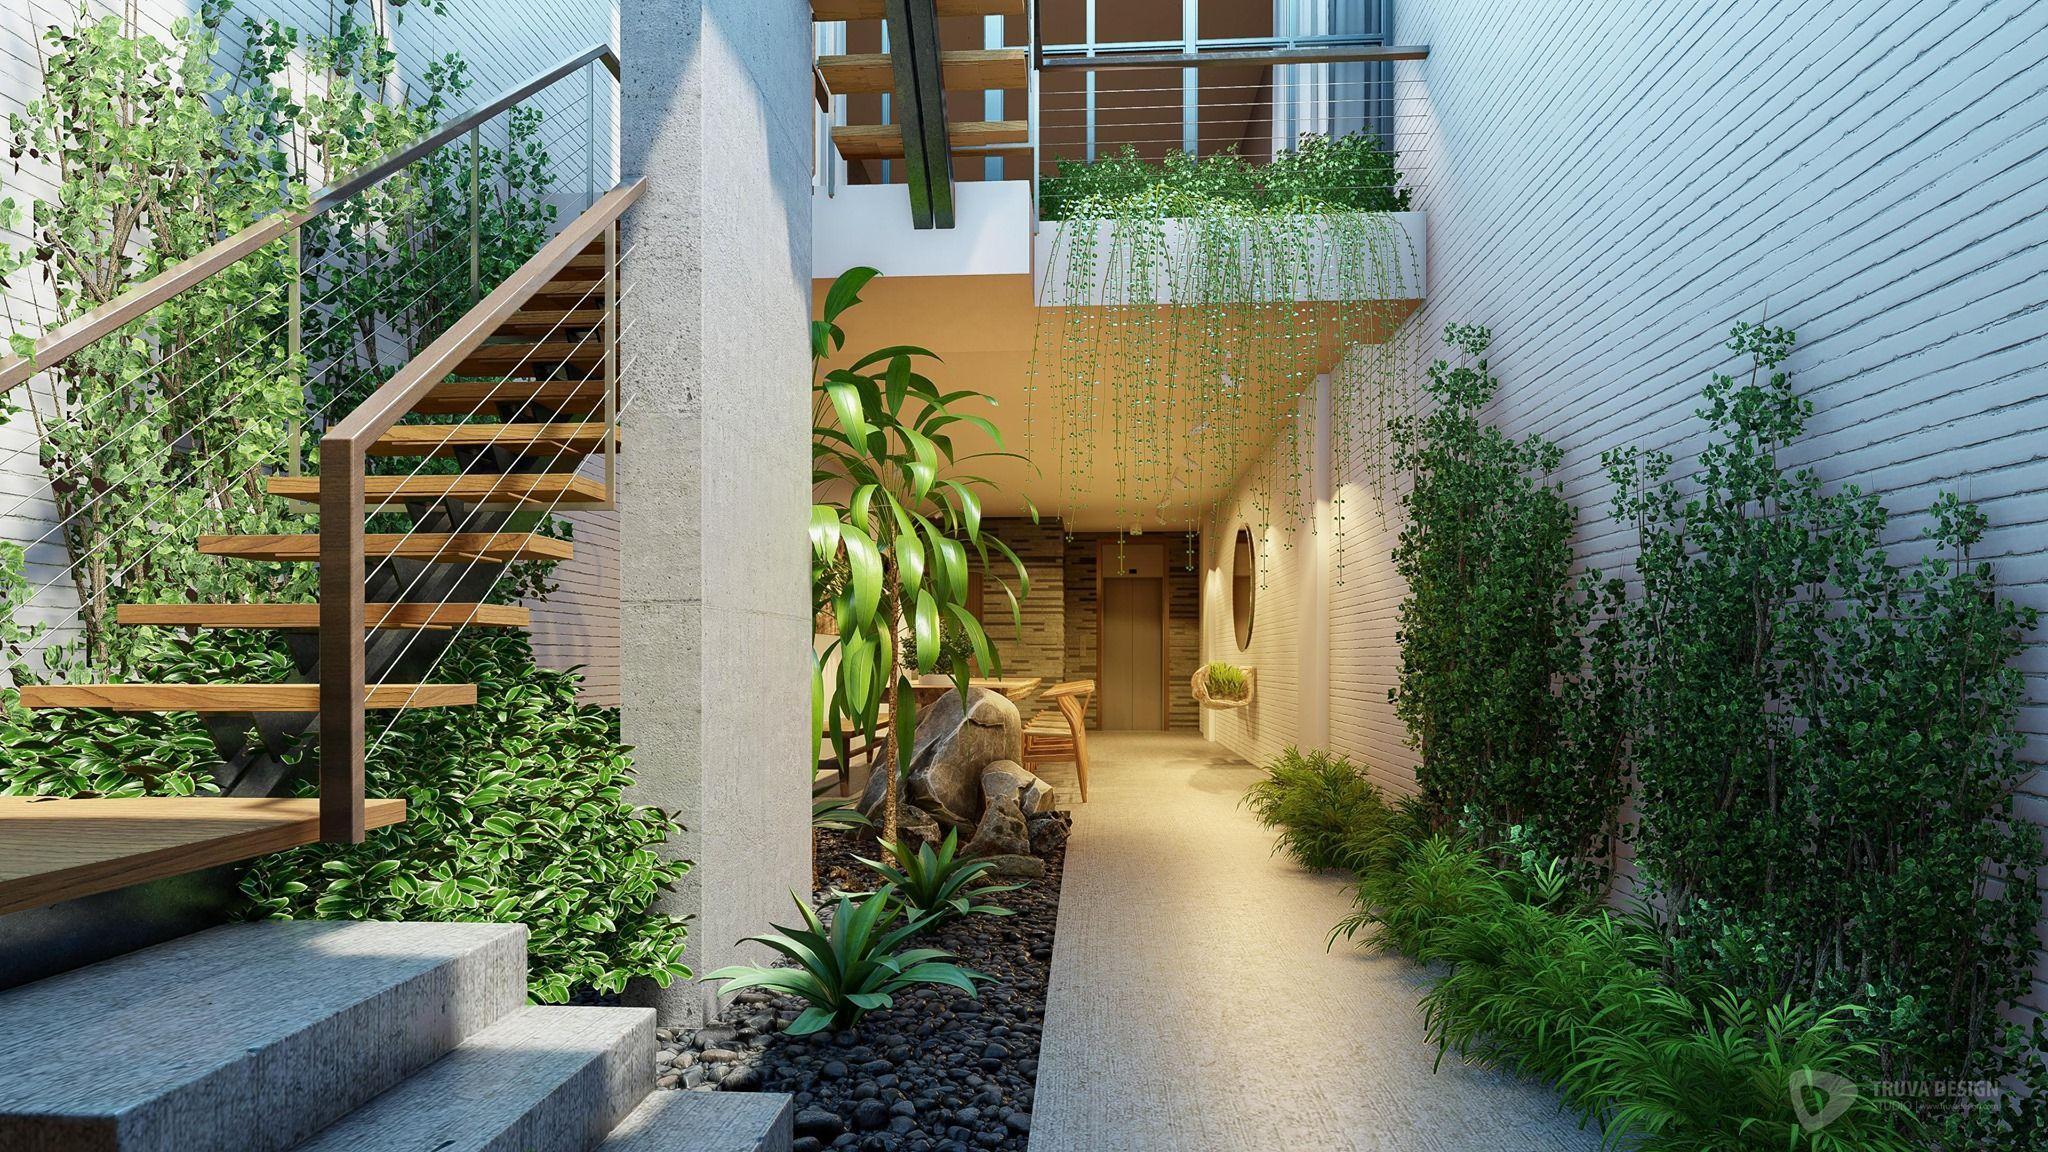 Interior And Garden Rendered In Lumion 10 By Truva Design Design Exterior Interior